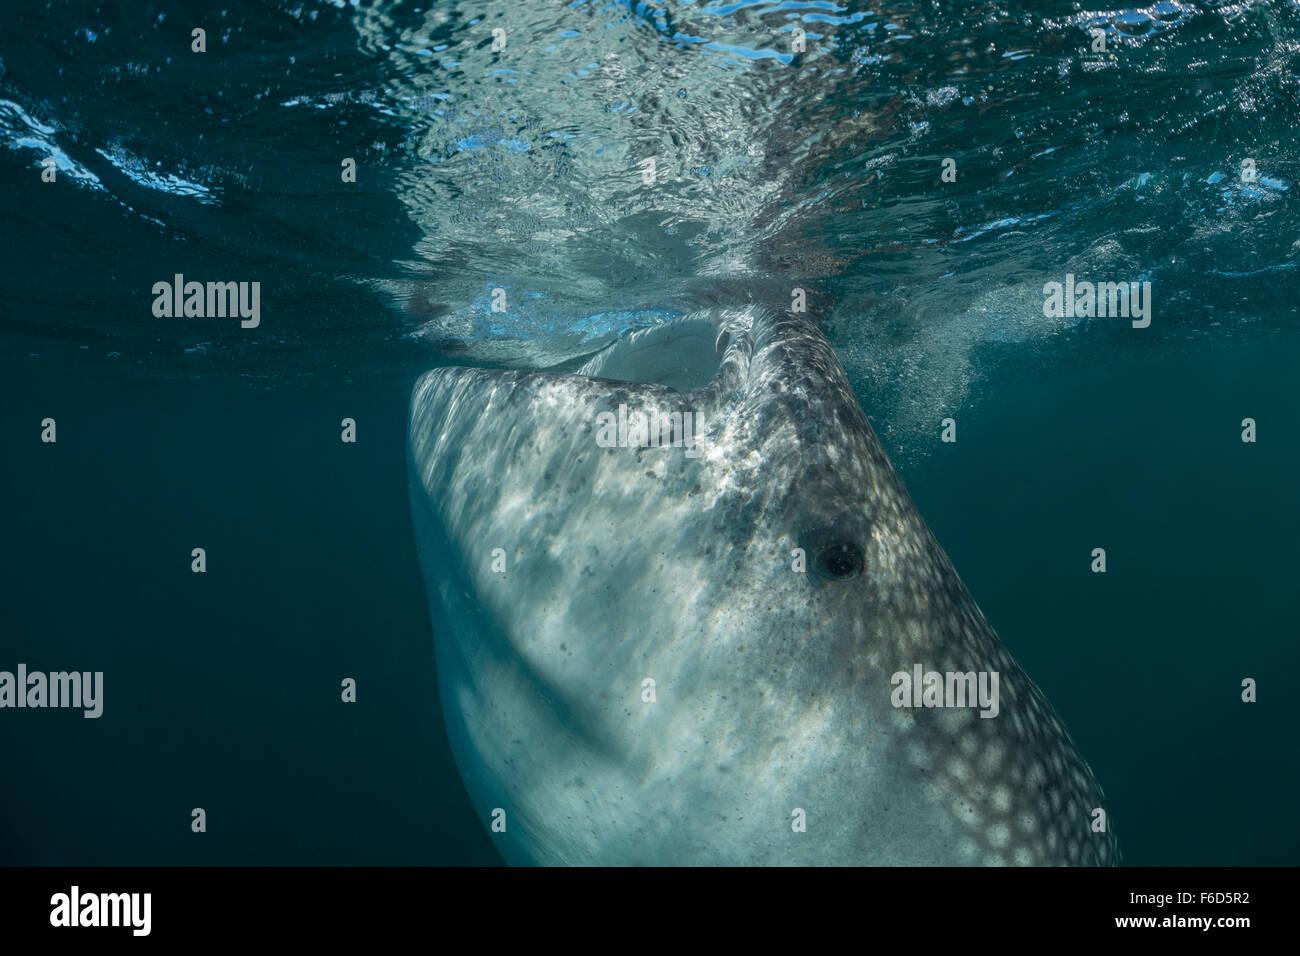 Whale Shark feeds on Plankton, Rhincodon typus, La Paz, Baja California Sur, Mexico - Stock Image